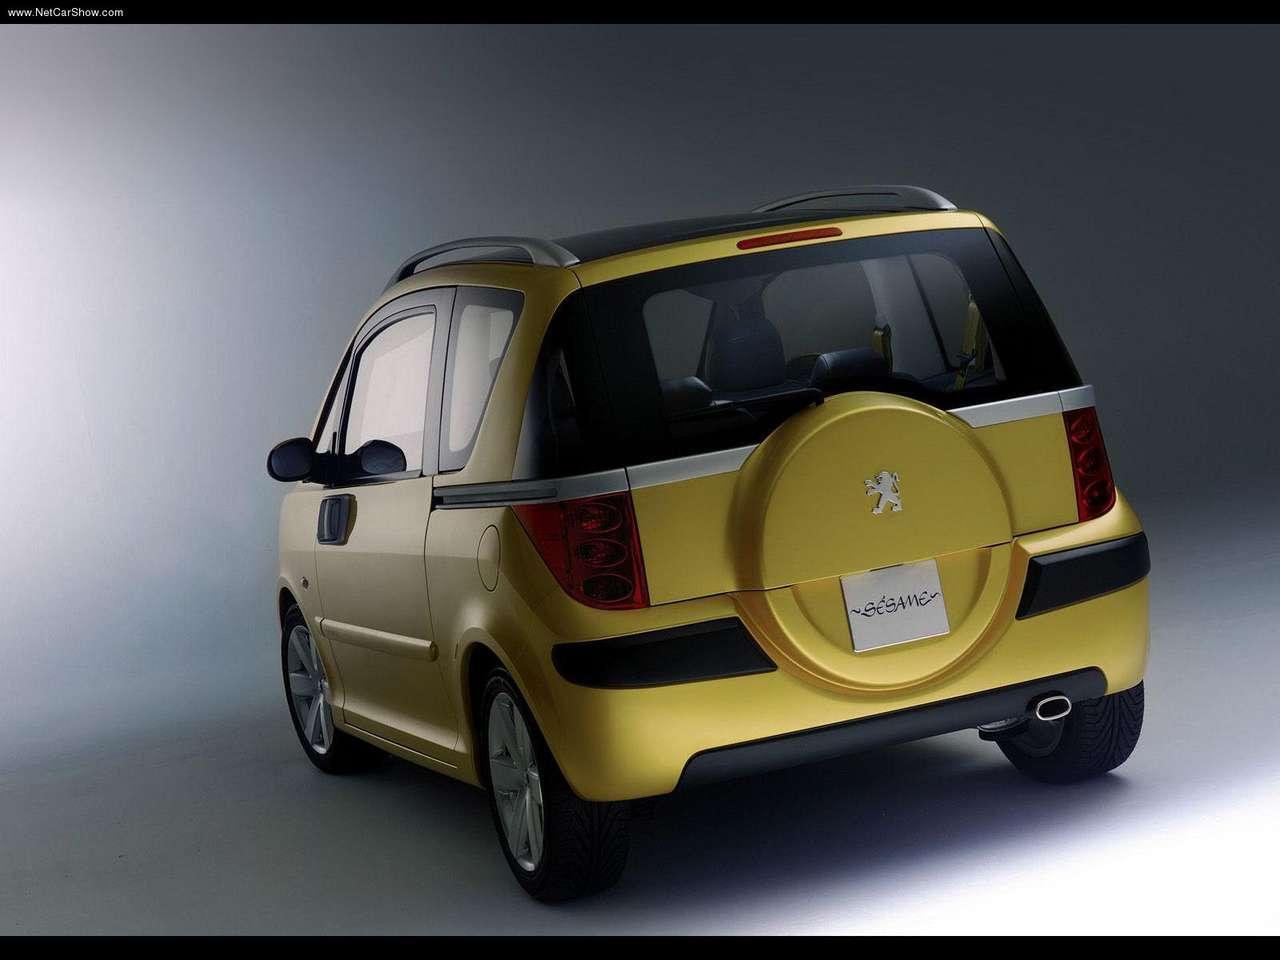 http://3.bp.blogspot.com/-AeRURaATIxQ/TXob2WZNK3I/AAAAAAAANGY/Pf76ExhNUy0/s1600/Peugeot-Sesame_Concept_2002_1280x960_wallpaper_05.jpg